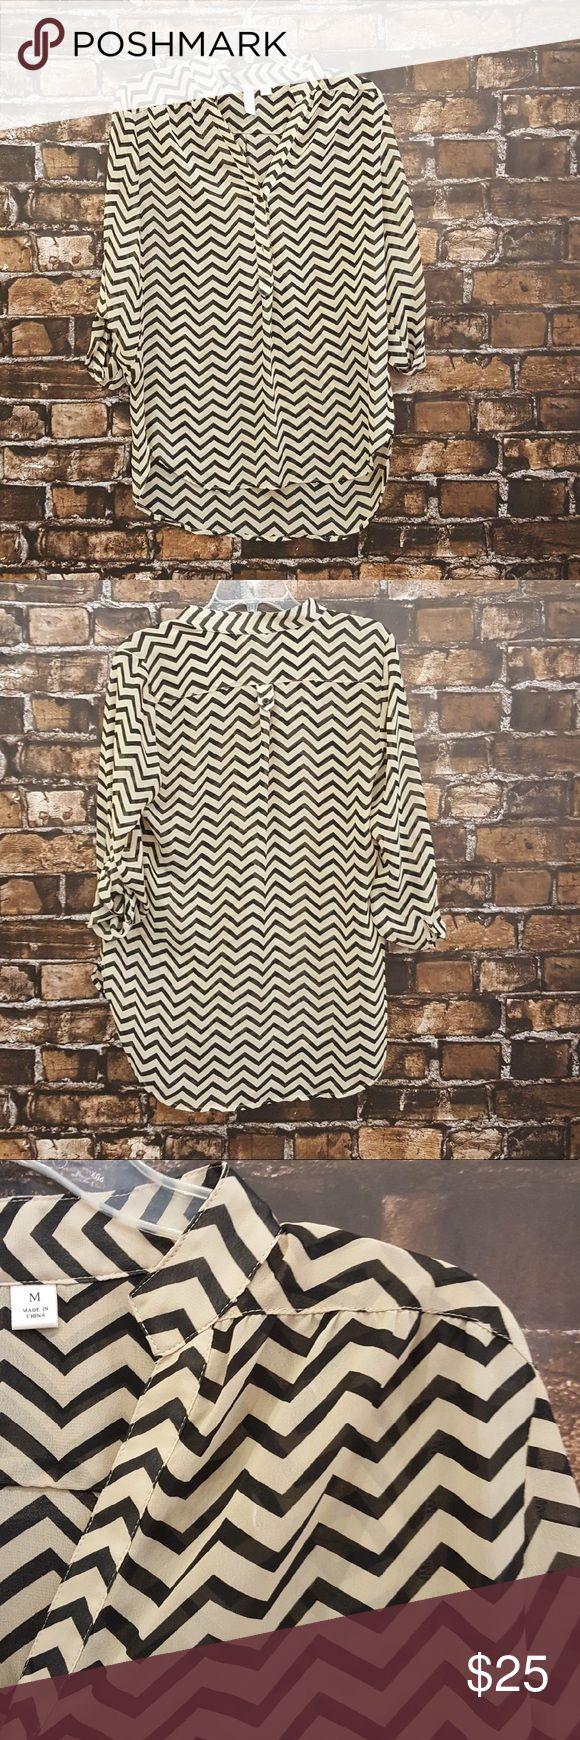 Tacera women's chevron top! Medium. Black and nude chevron top! Half collar with buttons half way down! (WT 1080) Tacera Tops Blouses